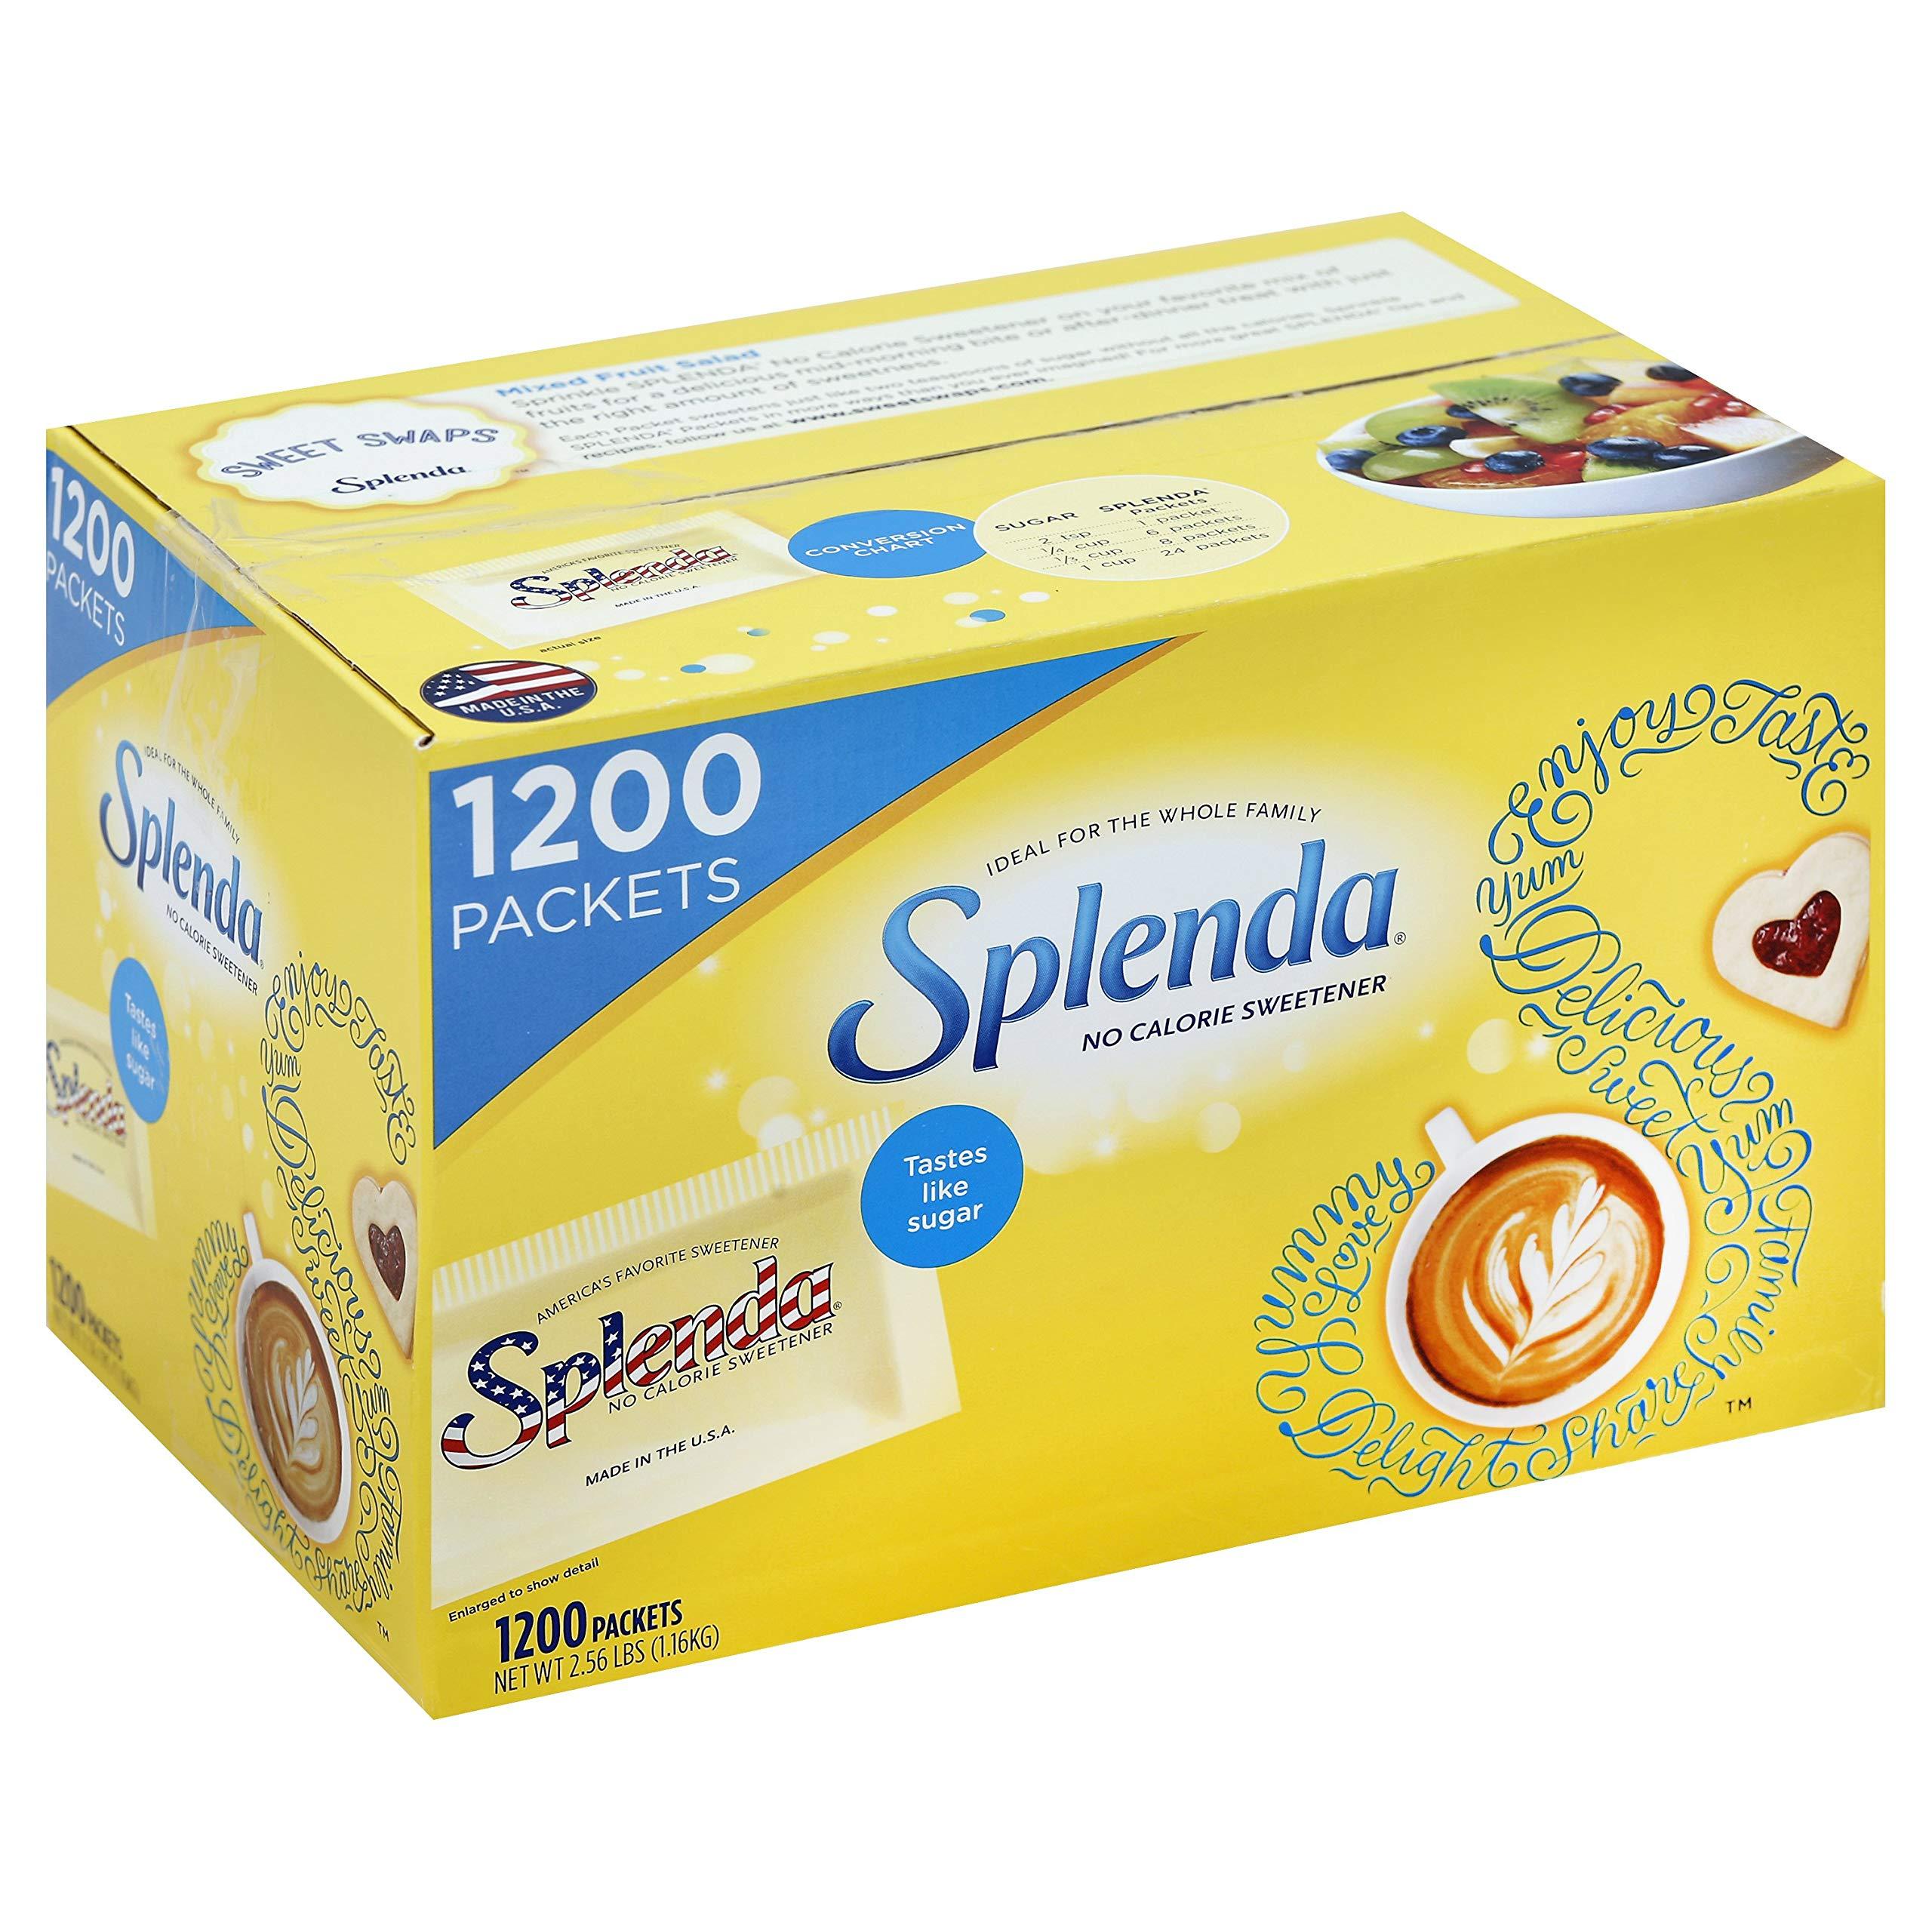 SPLENDA No Calorie Sweetener, Single-Serve Packets (1,200 Count) by Splenda